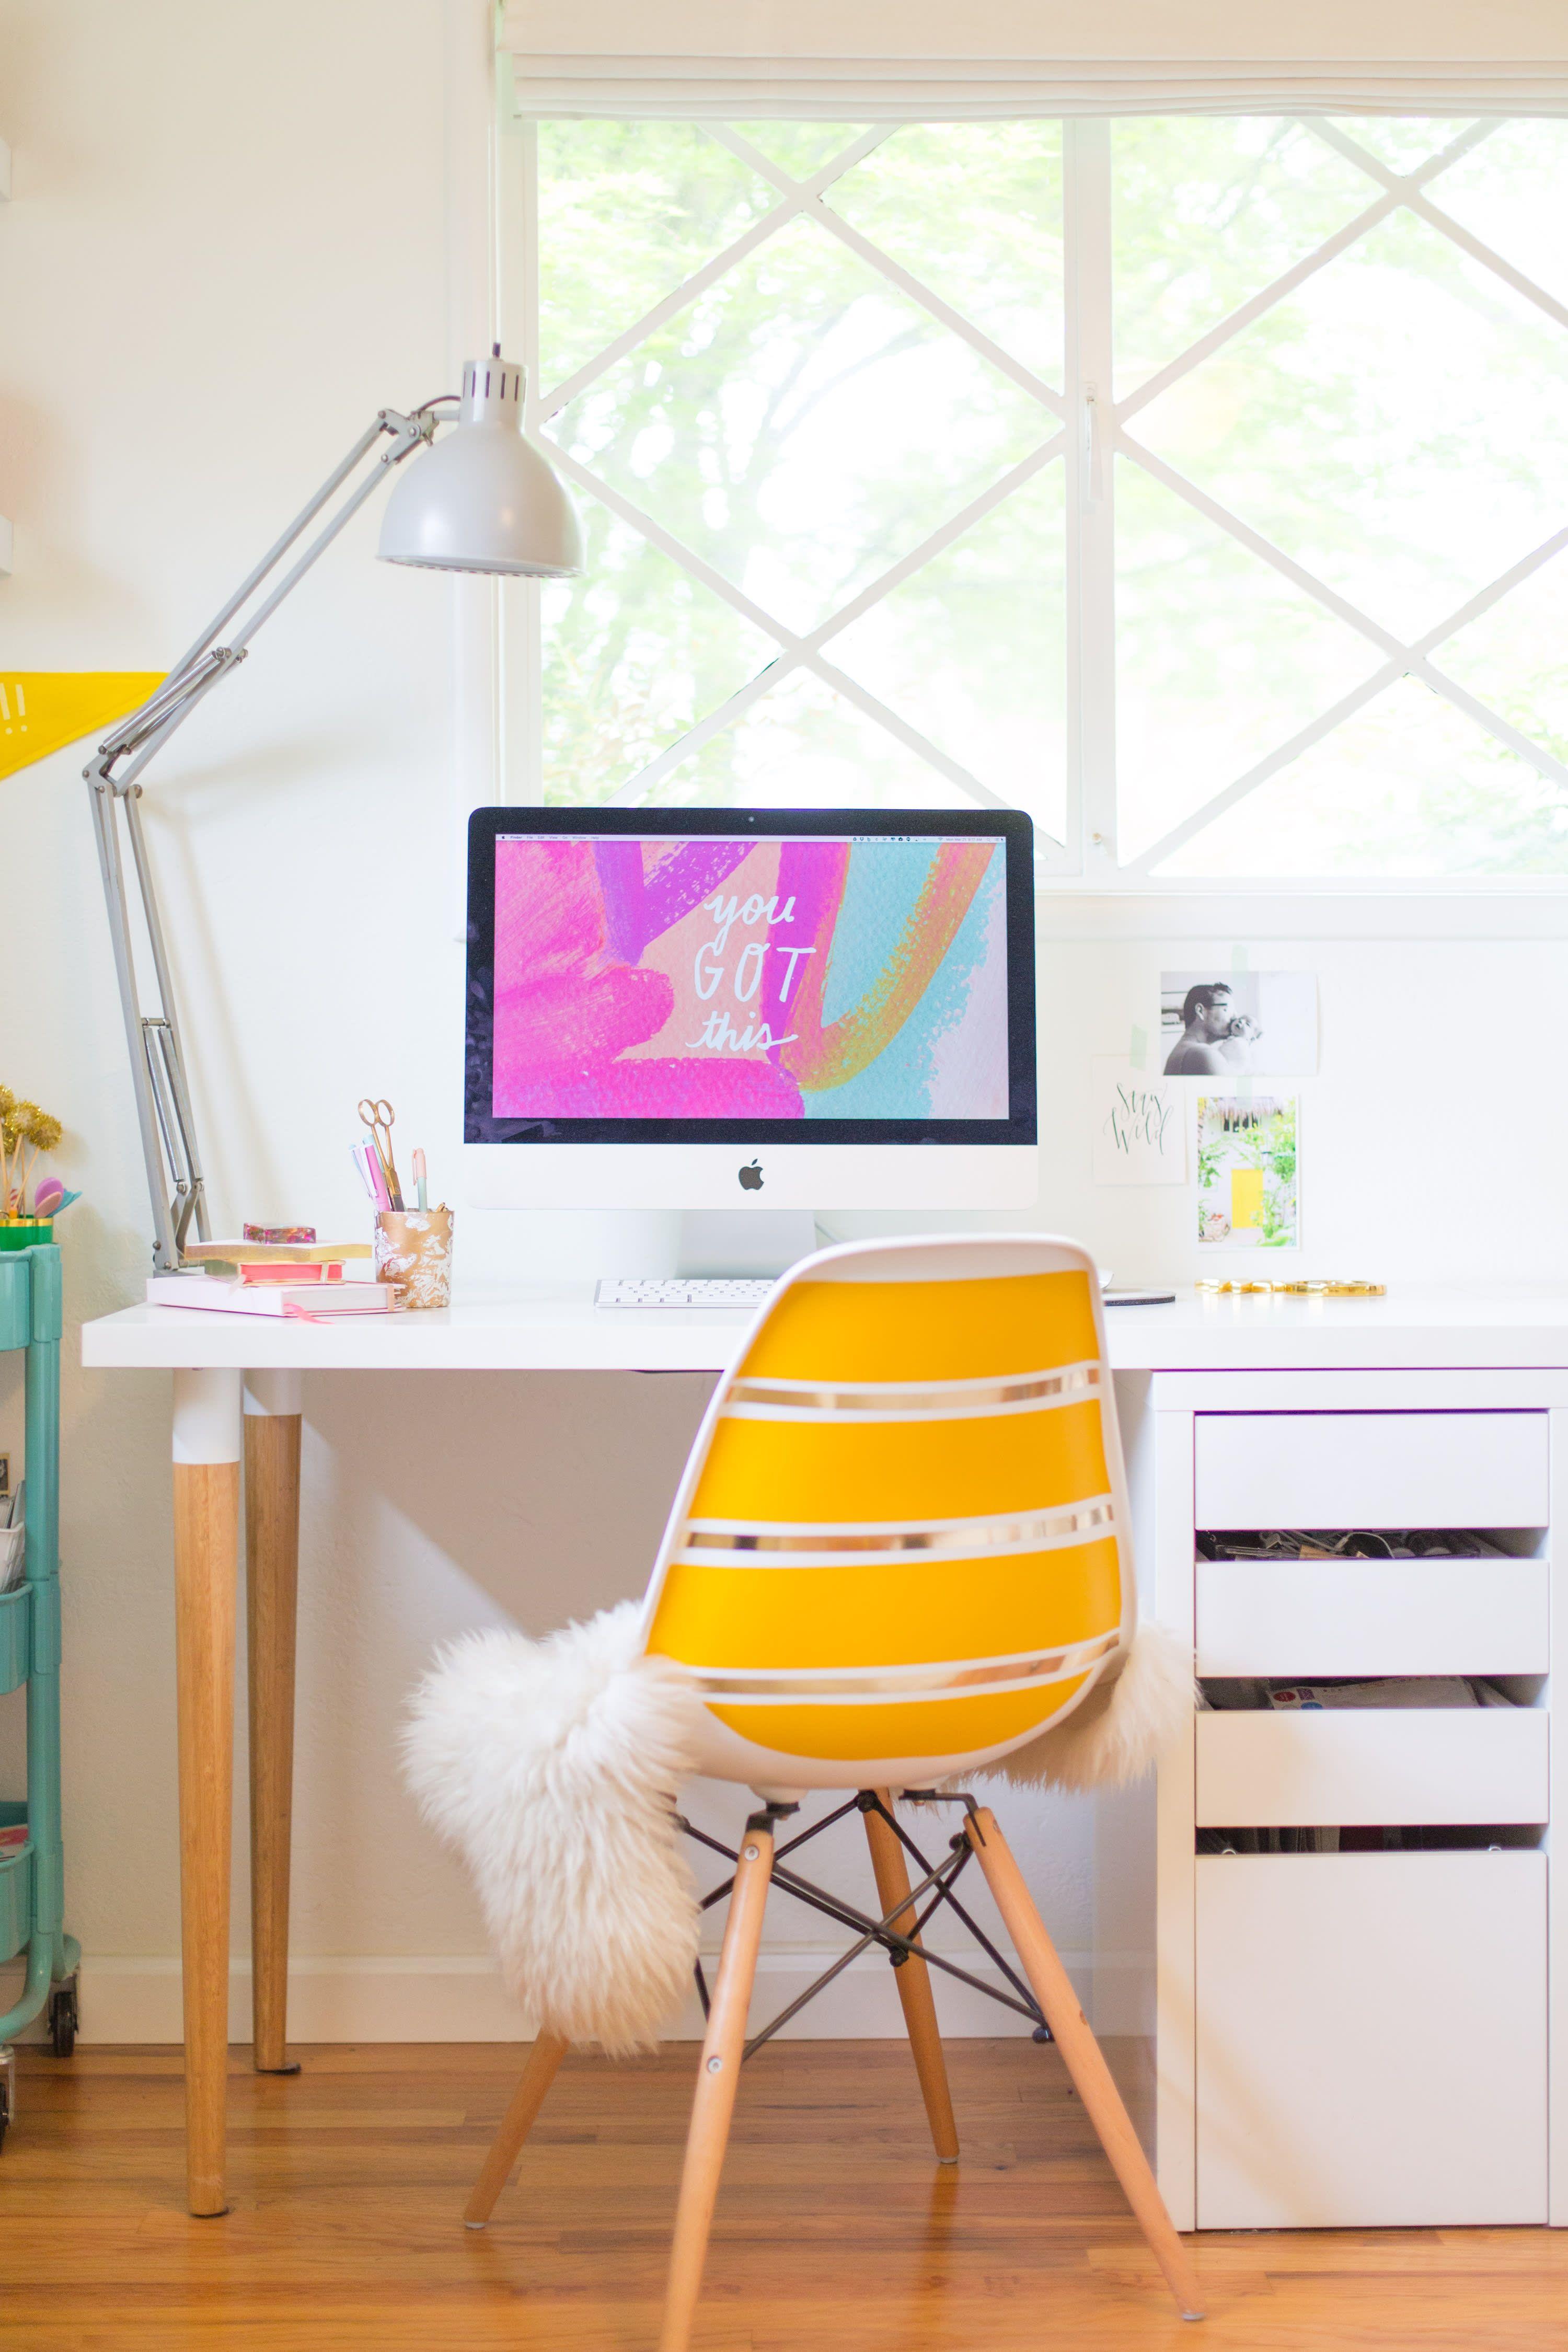 5 Ikea Desk Hacks That Mean Serious Business Ikea Desk Hack Ikea Desk Diy Desk Decor